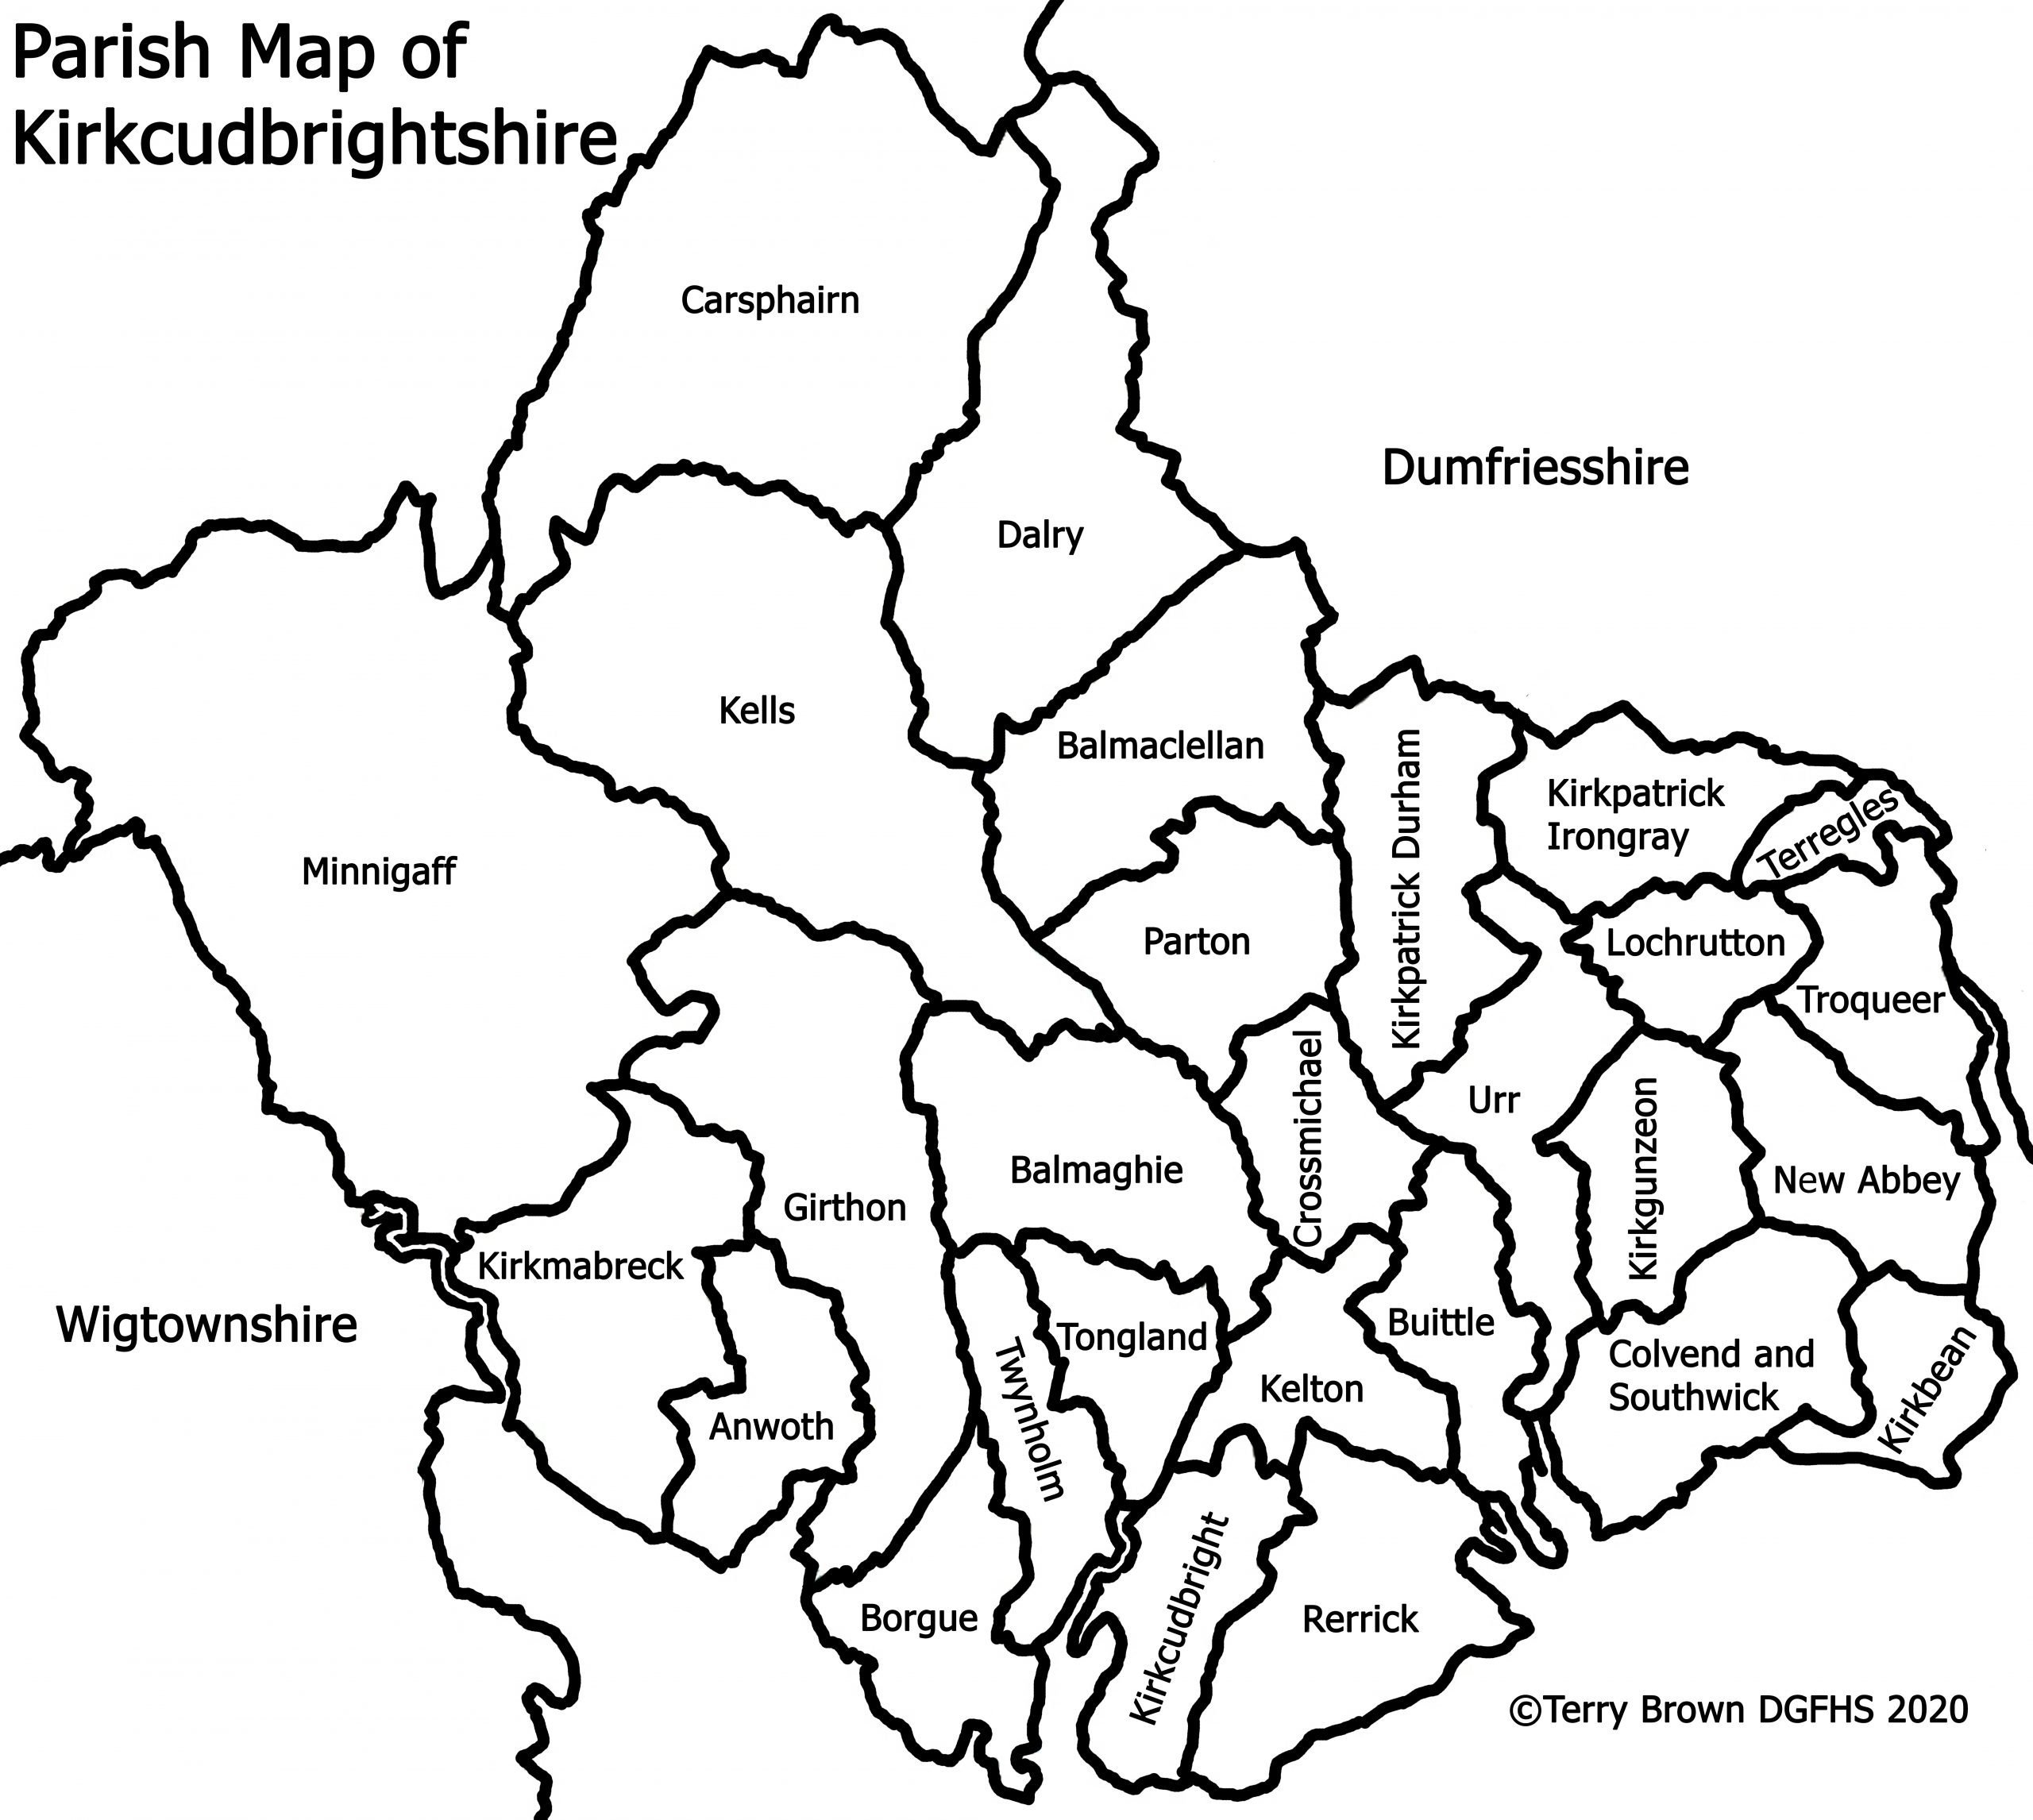 Parish Map of Kirkcudbrightshire